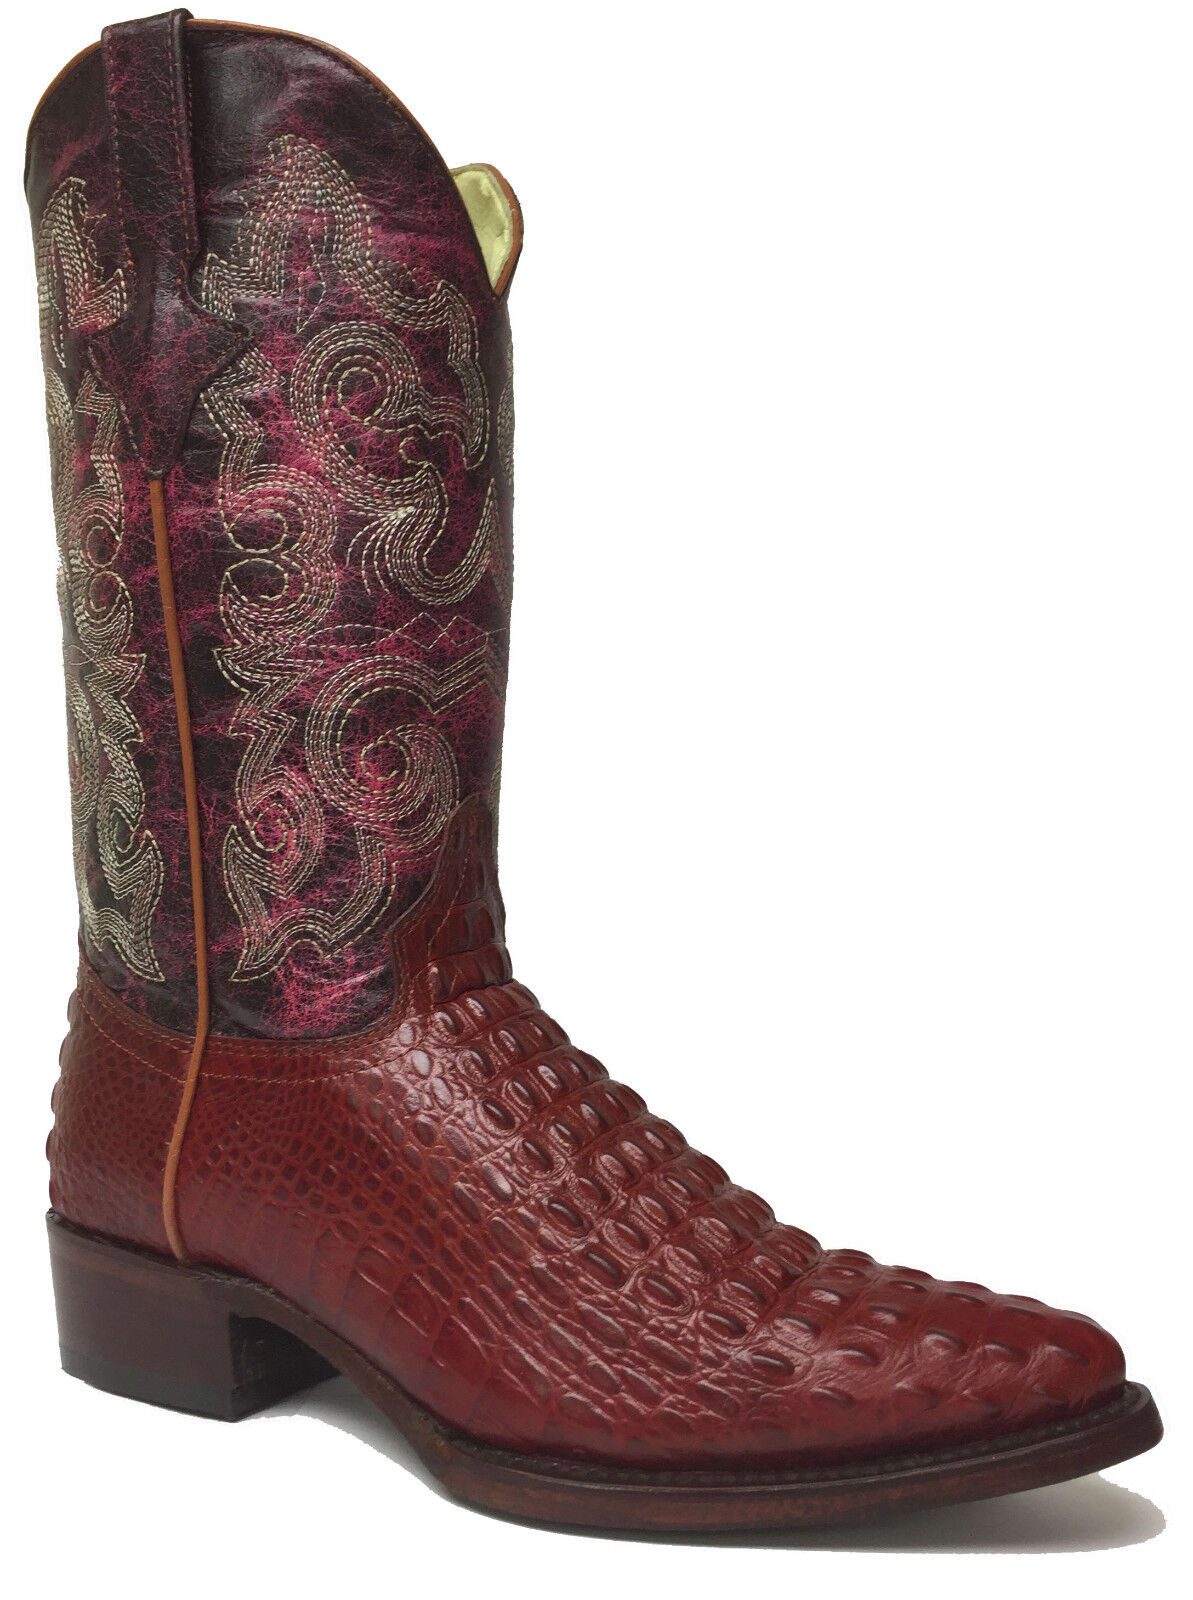 New Uomo Cognac Rust Brown Crocodile Alligator Pelle Western Cowboy Stivali J